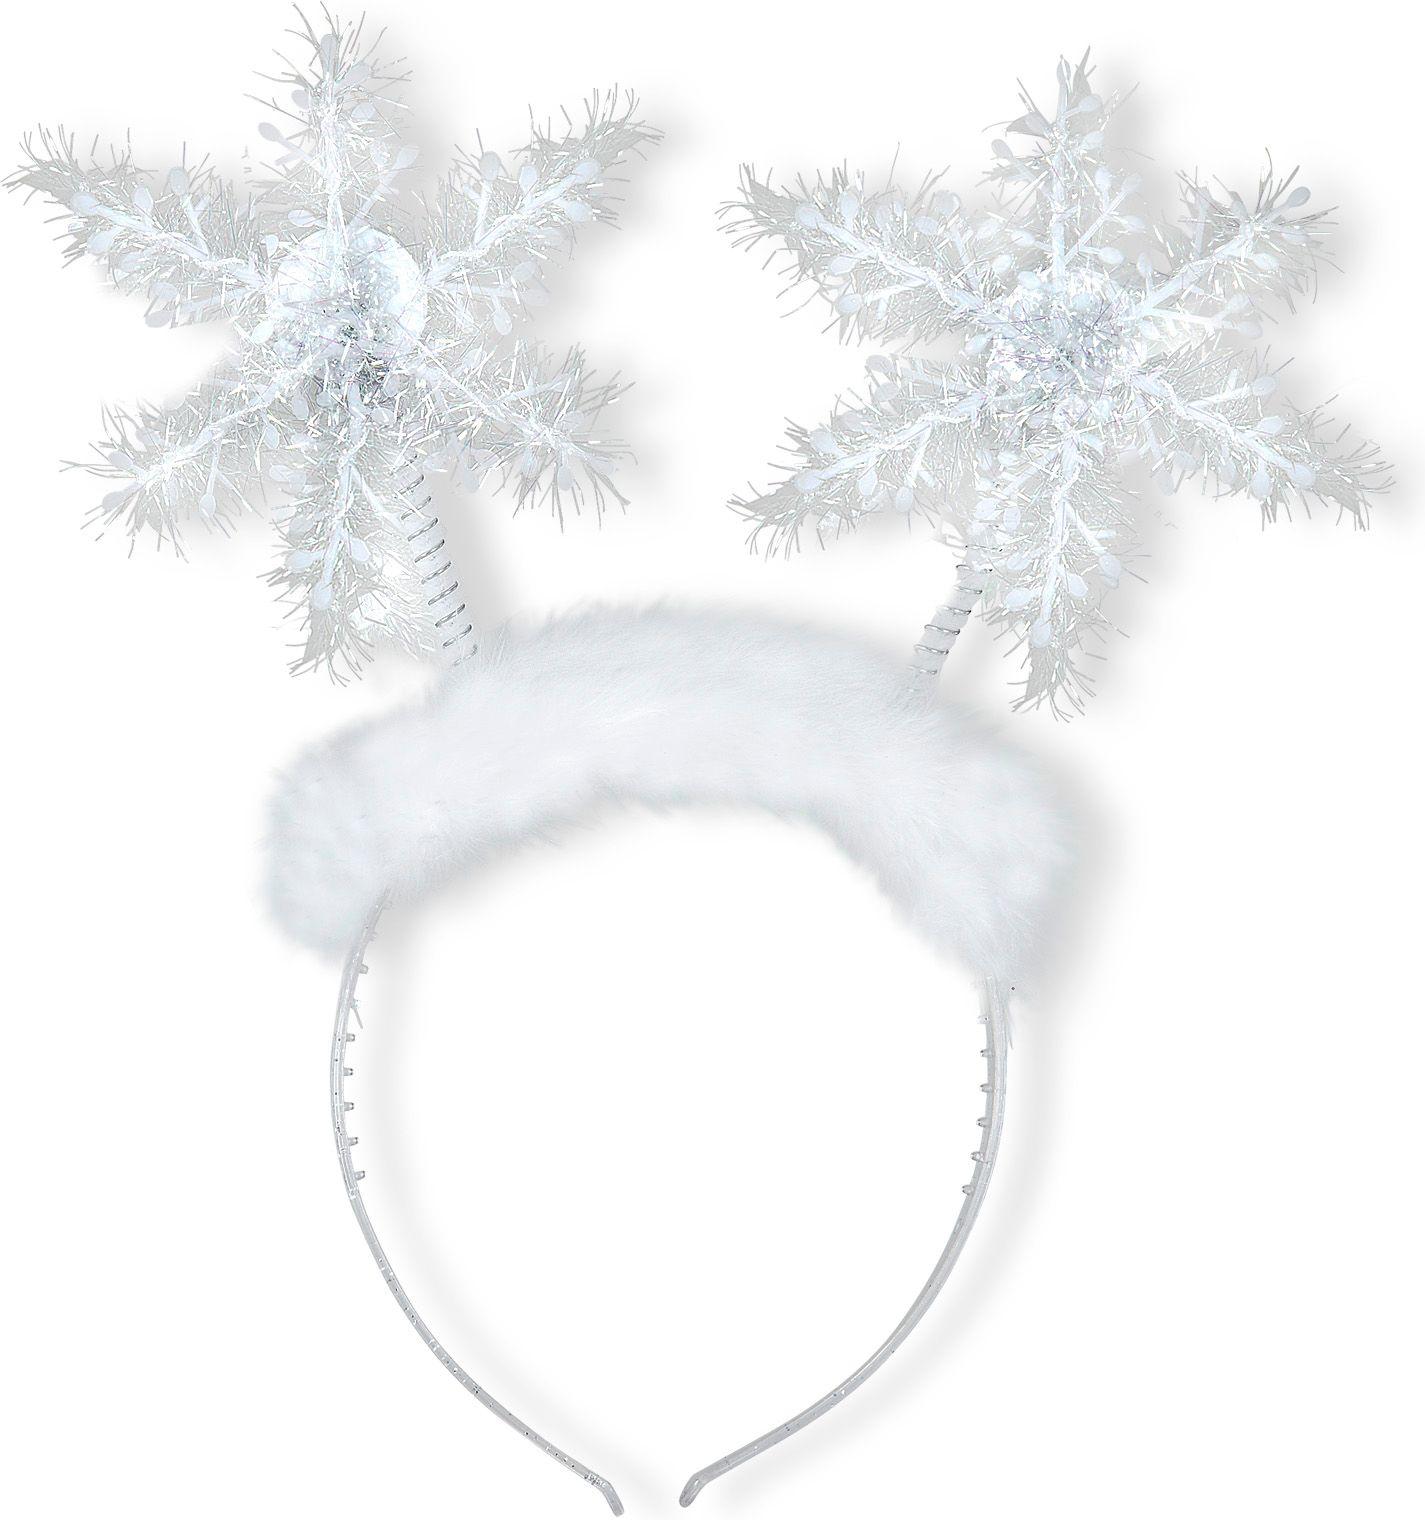 Sneeuwvlokken hoofdband